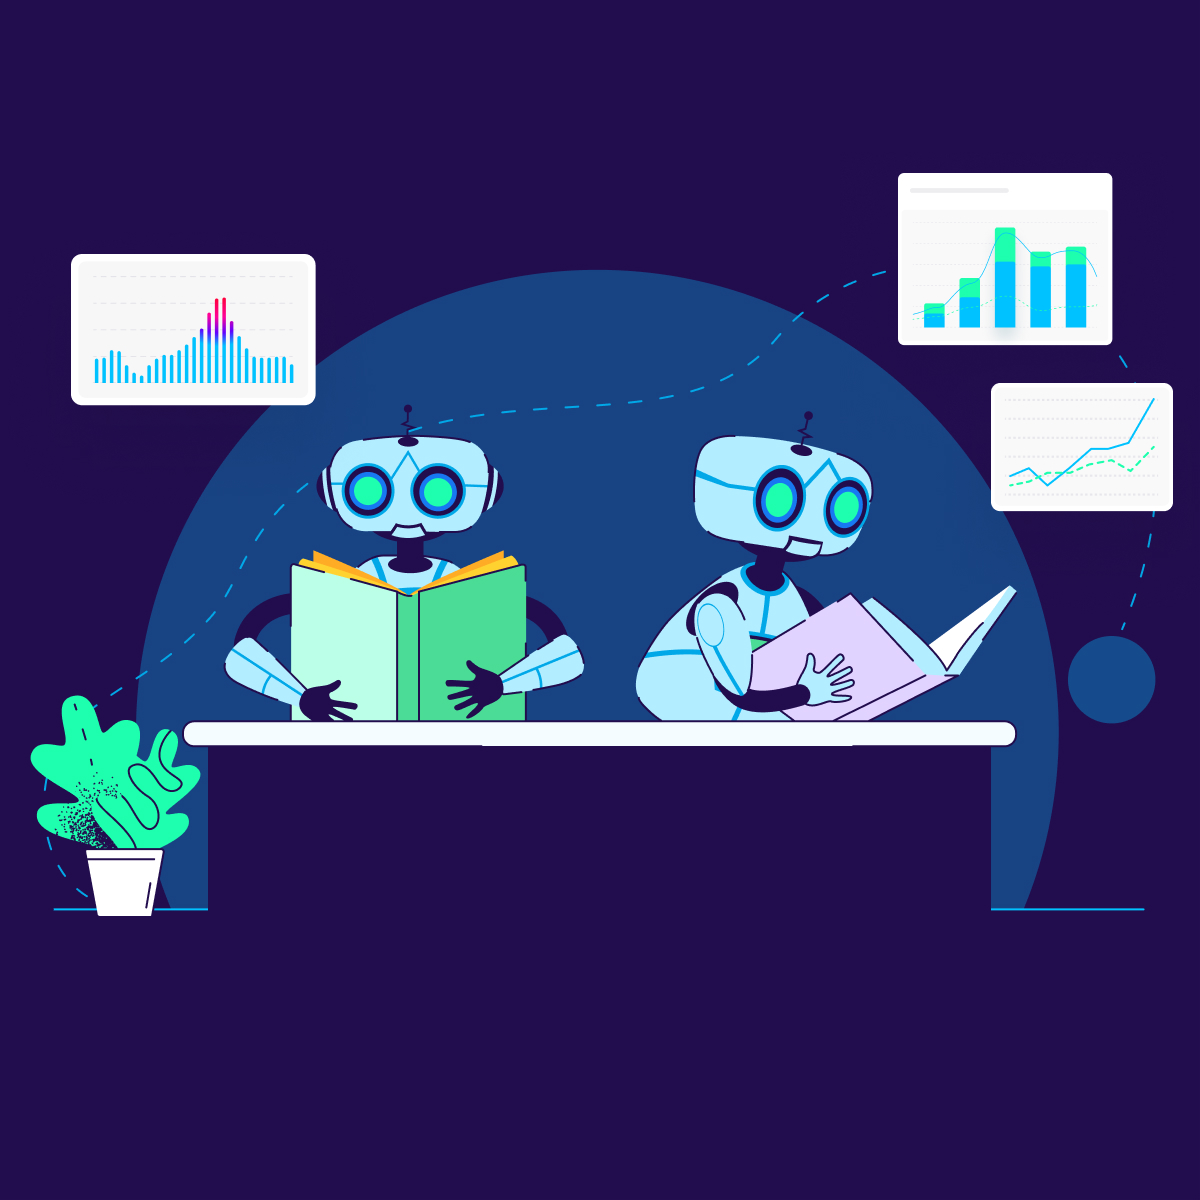 machine learning digital marketing - Square